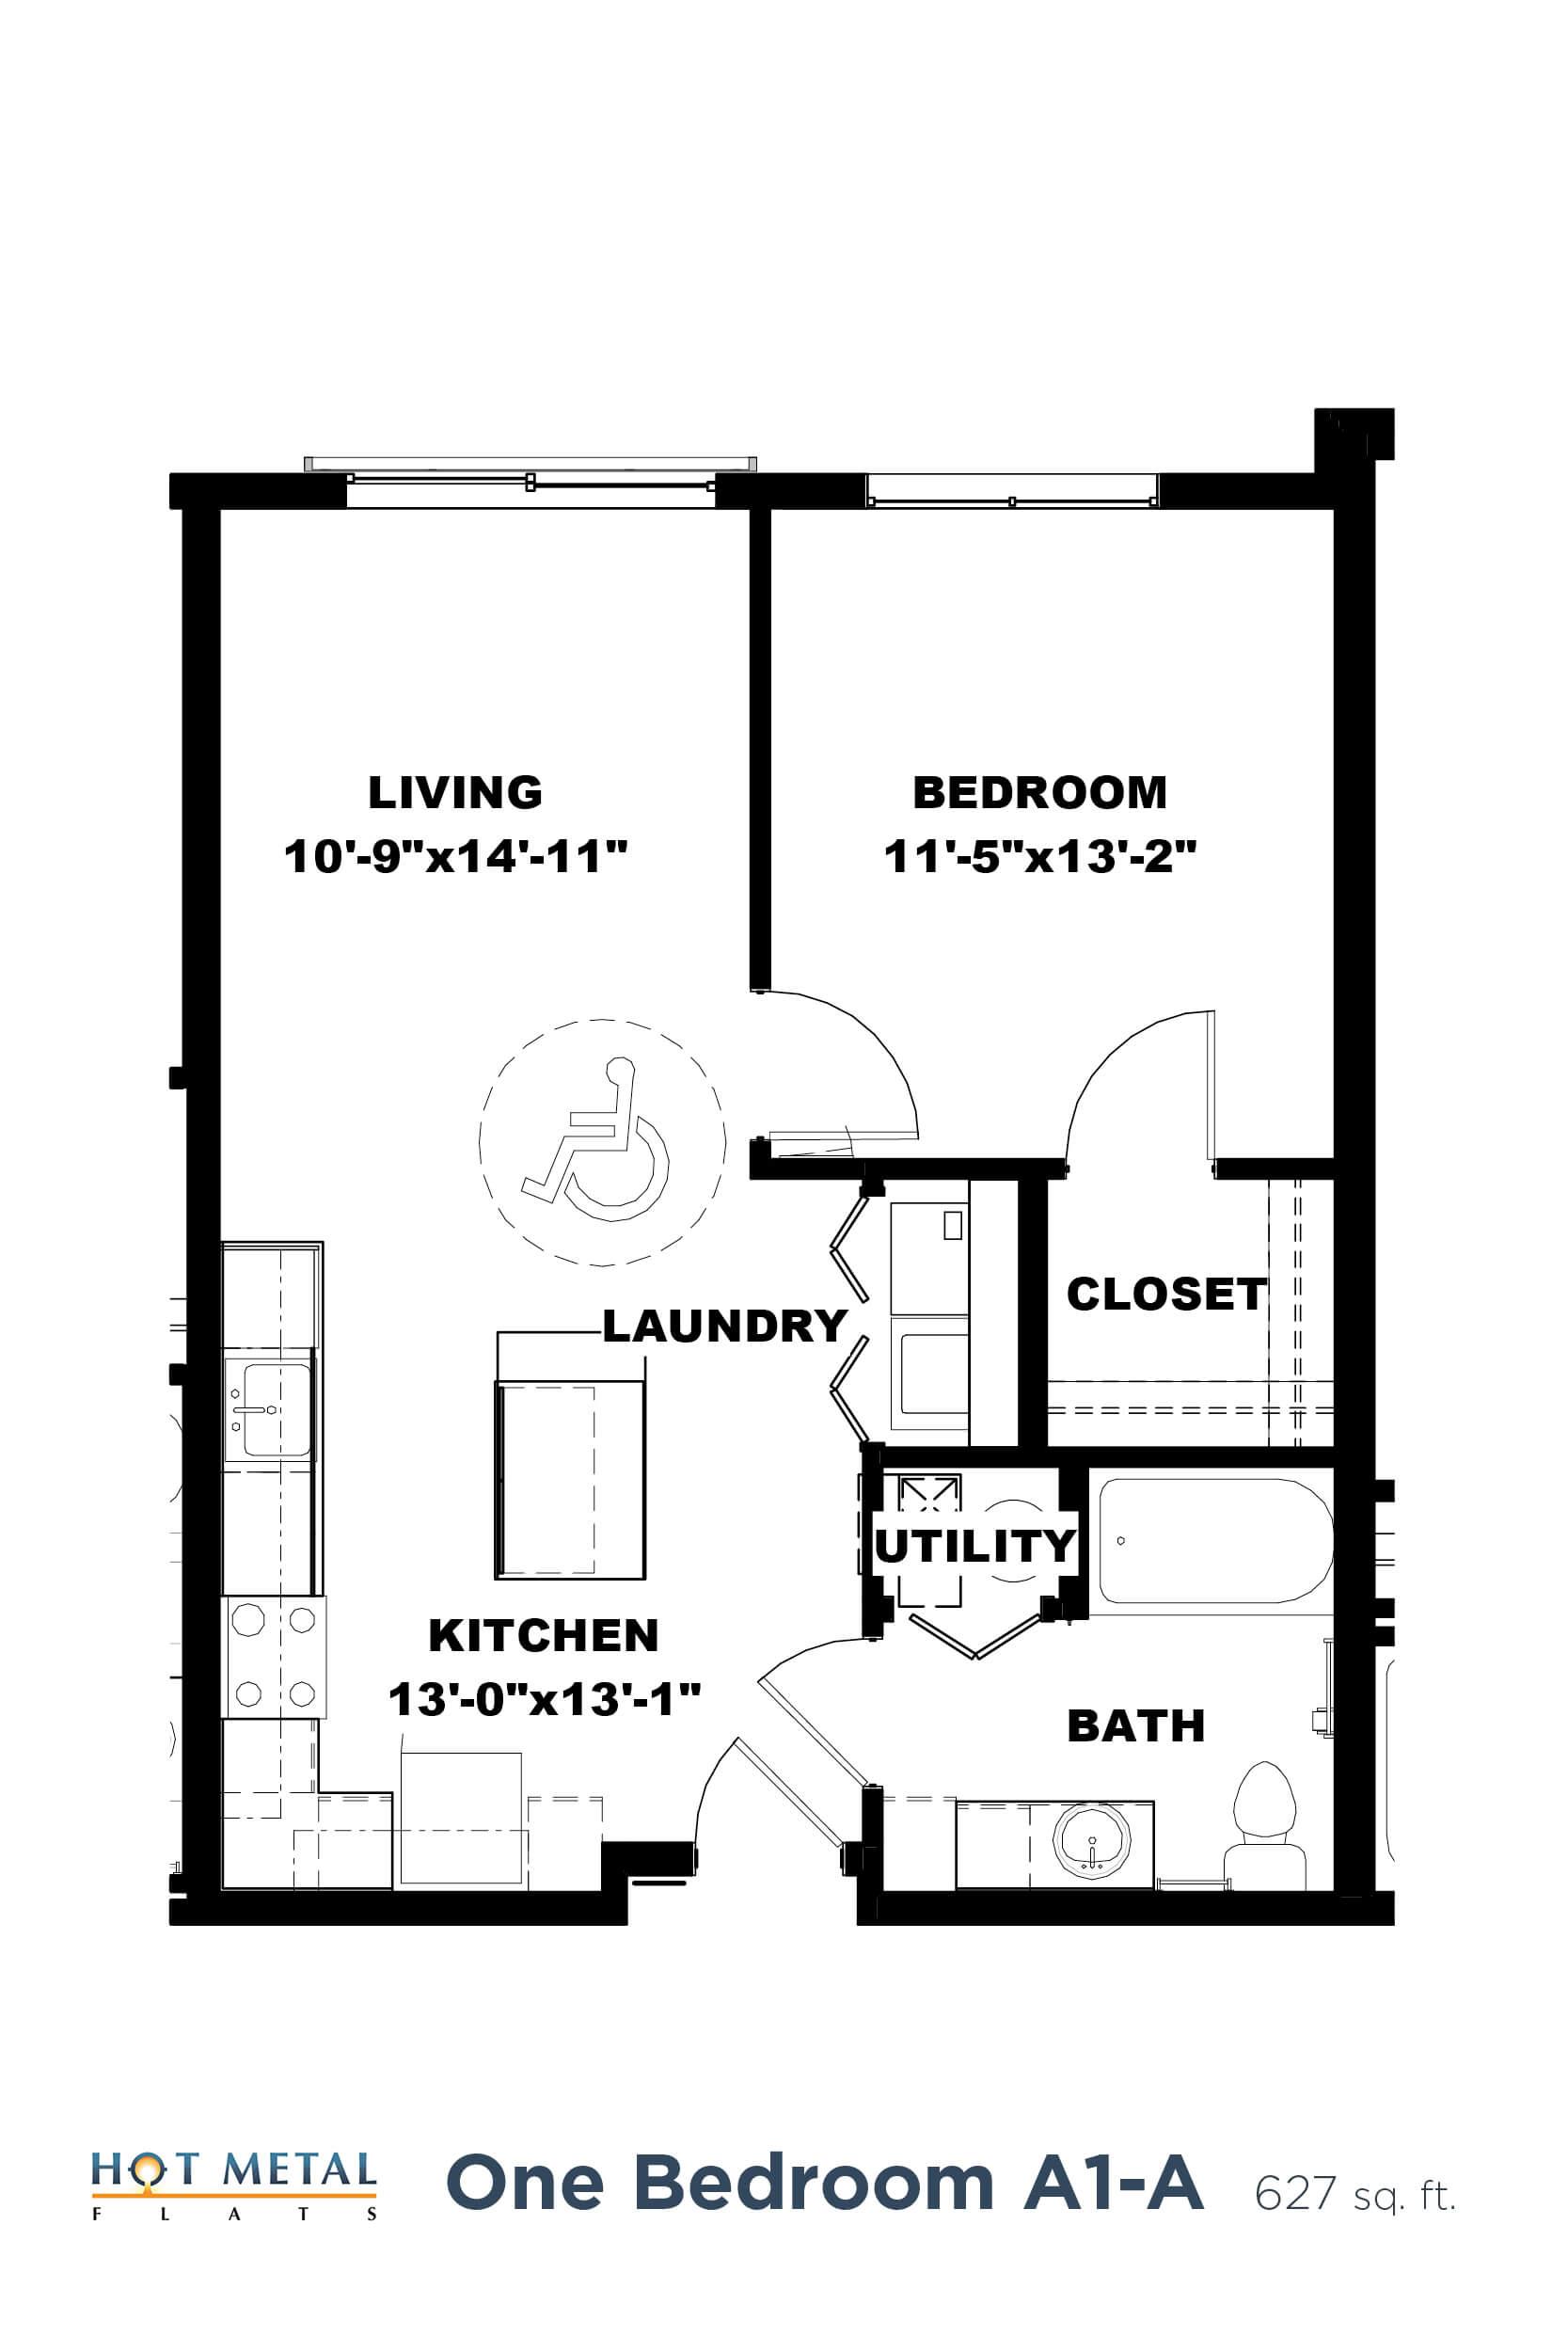 Floor Plan  Hot Metal Flats A1-A floorplan, Hot Metal Flats apartments, Pittsburgh, PA, opens a dialog